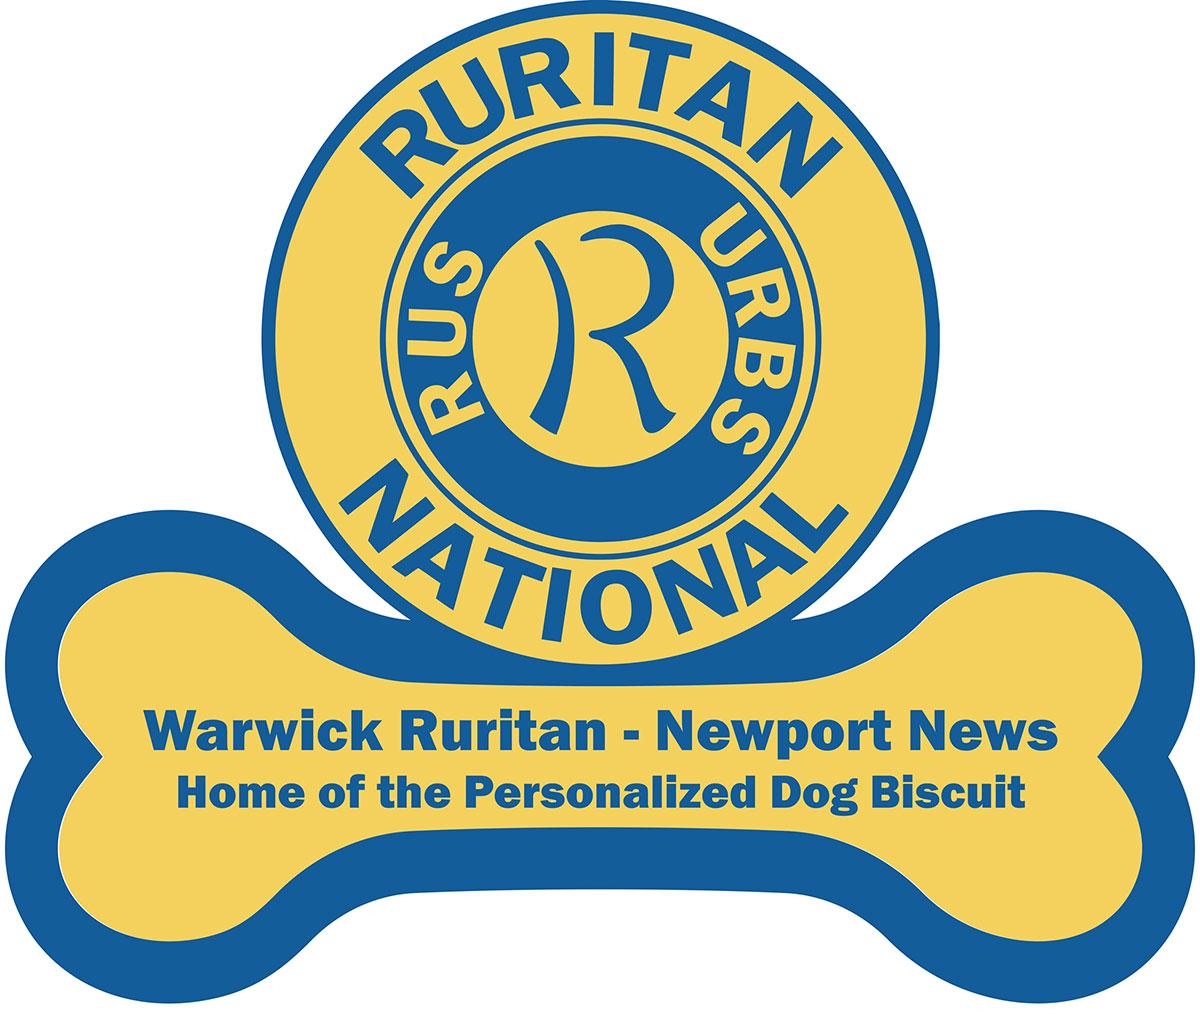 Warwick Ruritan – Newport News